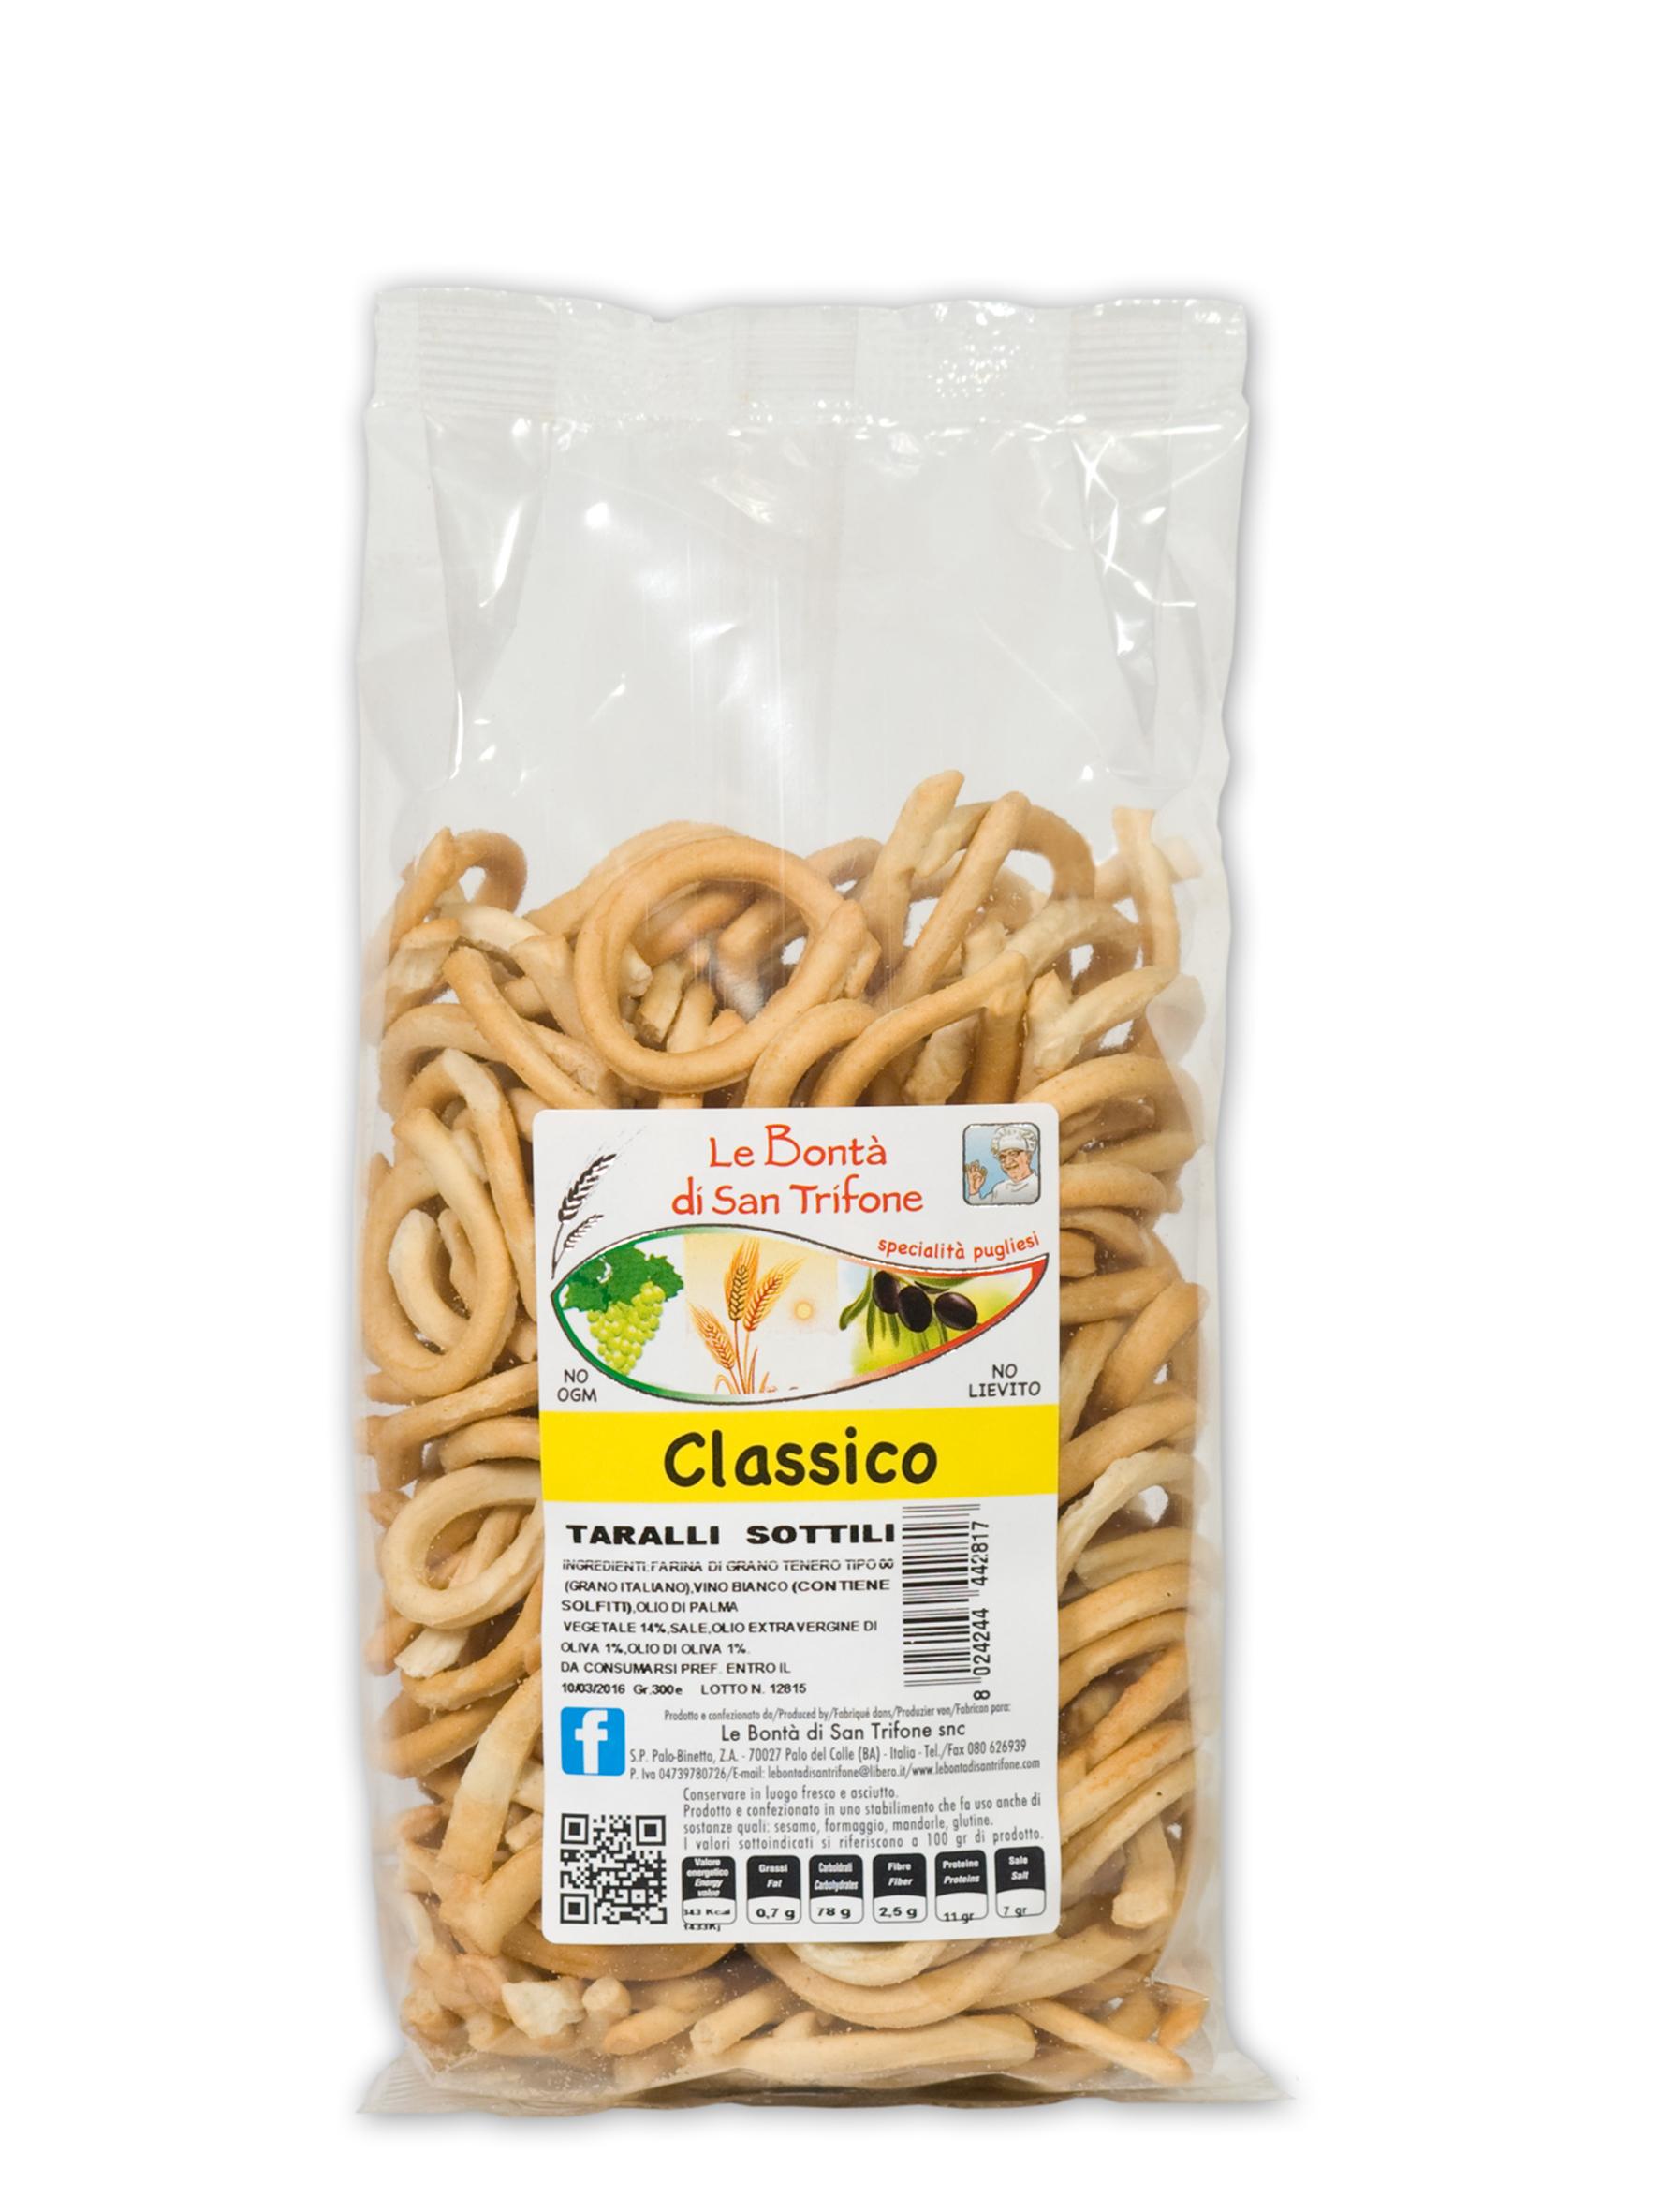 Taralli Sottili (gusto classico)